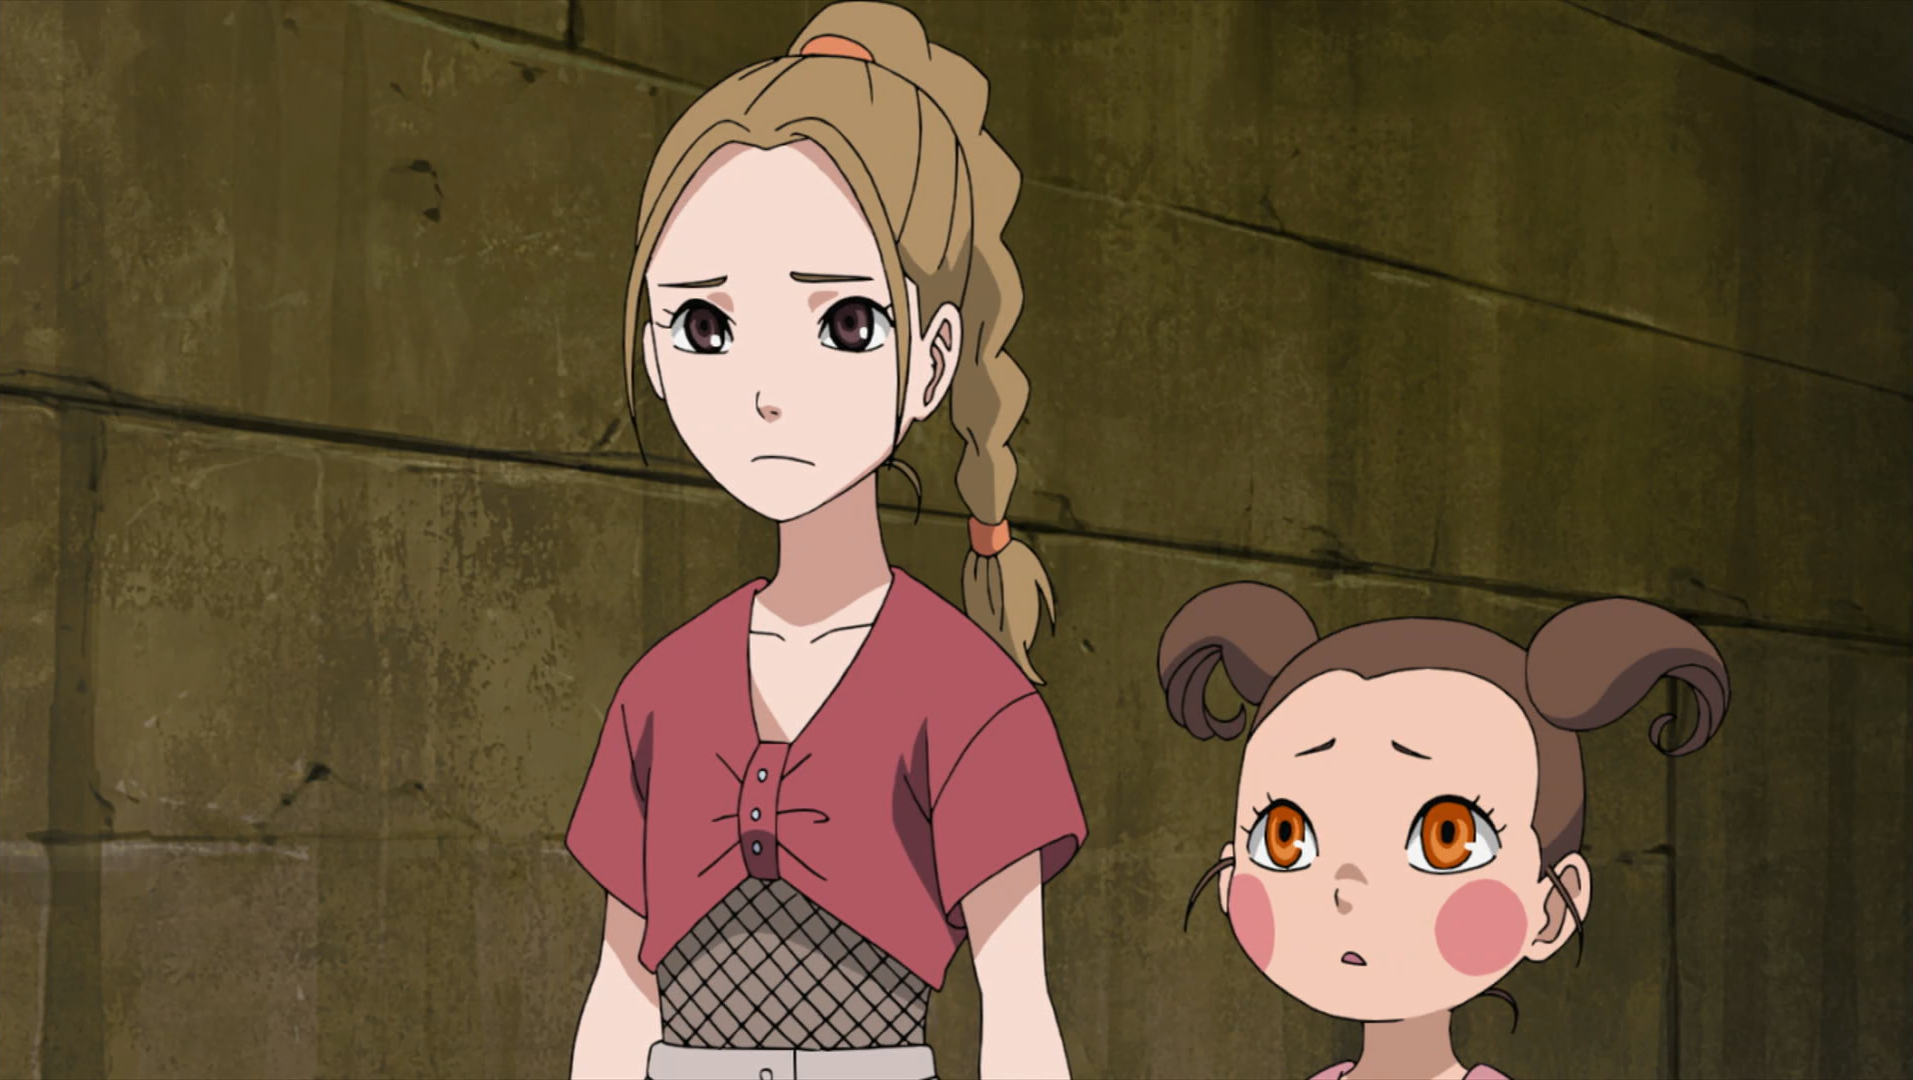 Naruto Shippuden Episode 413 Hopes Entrusted To The Future ...